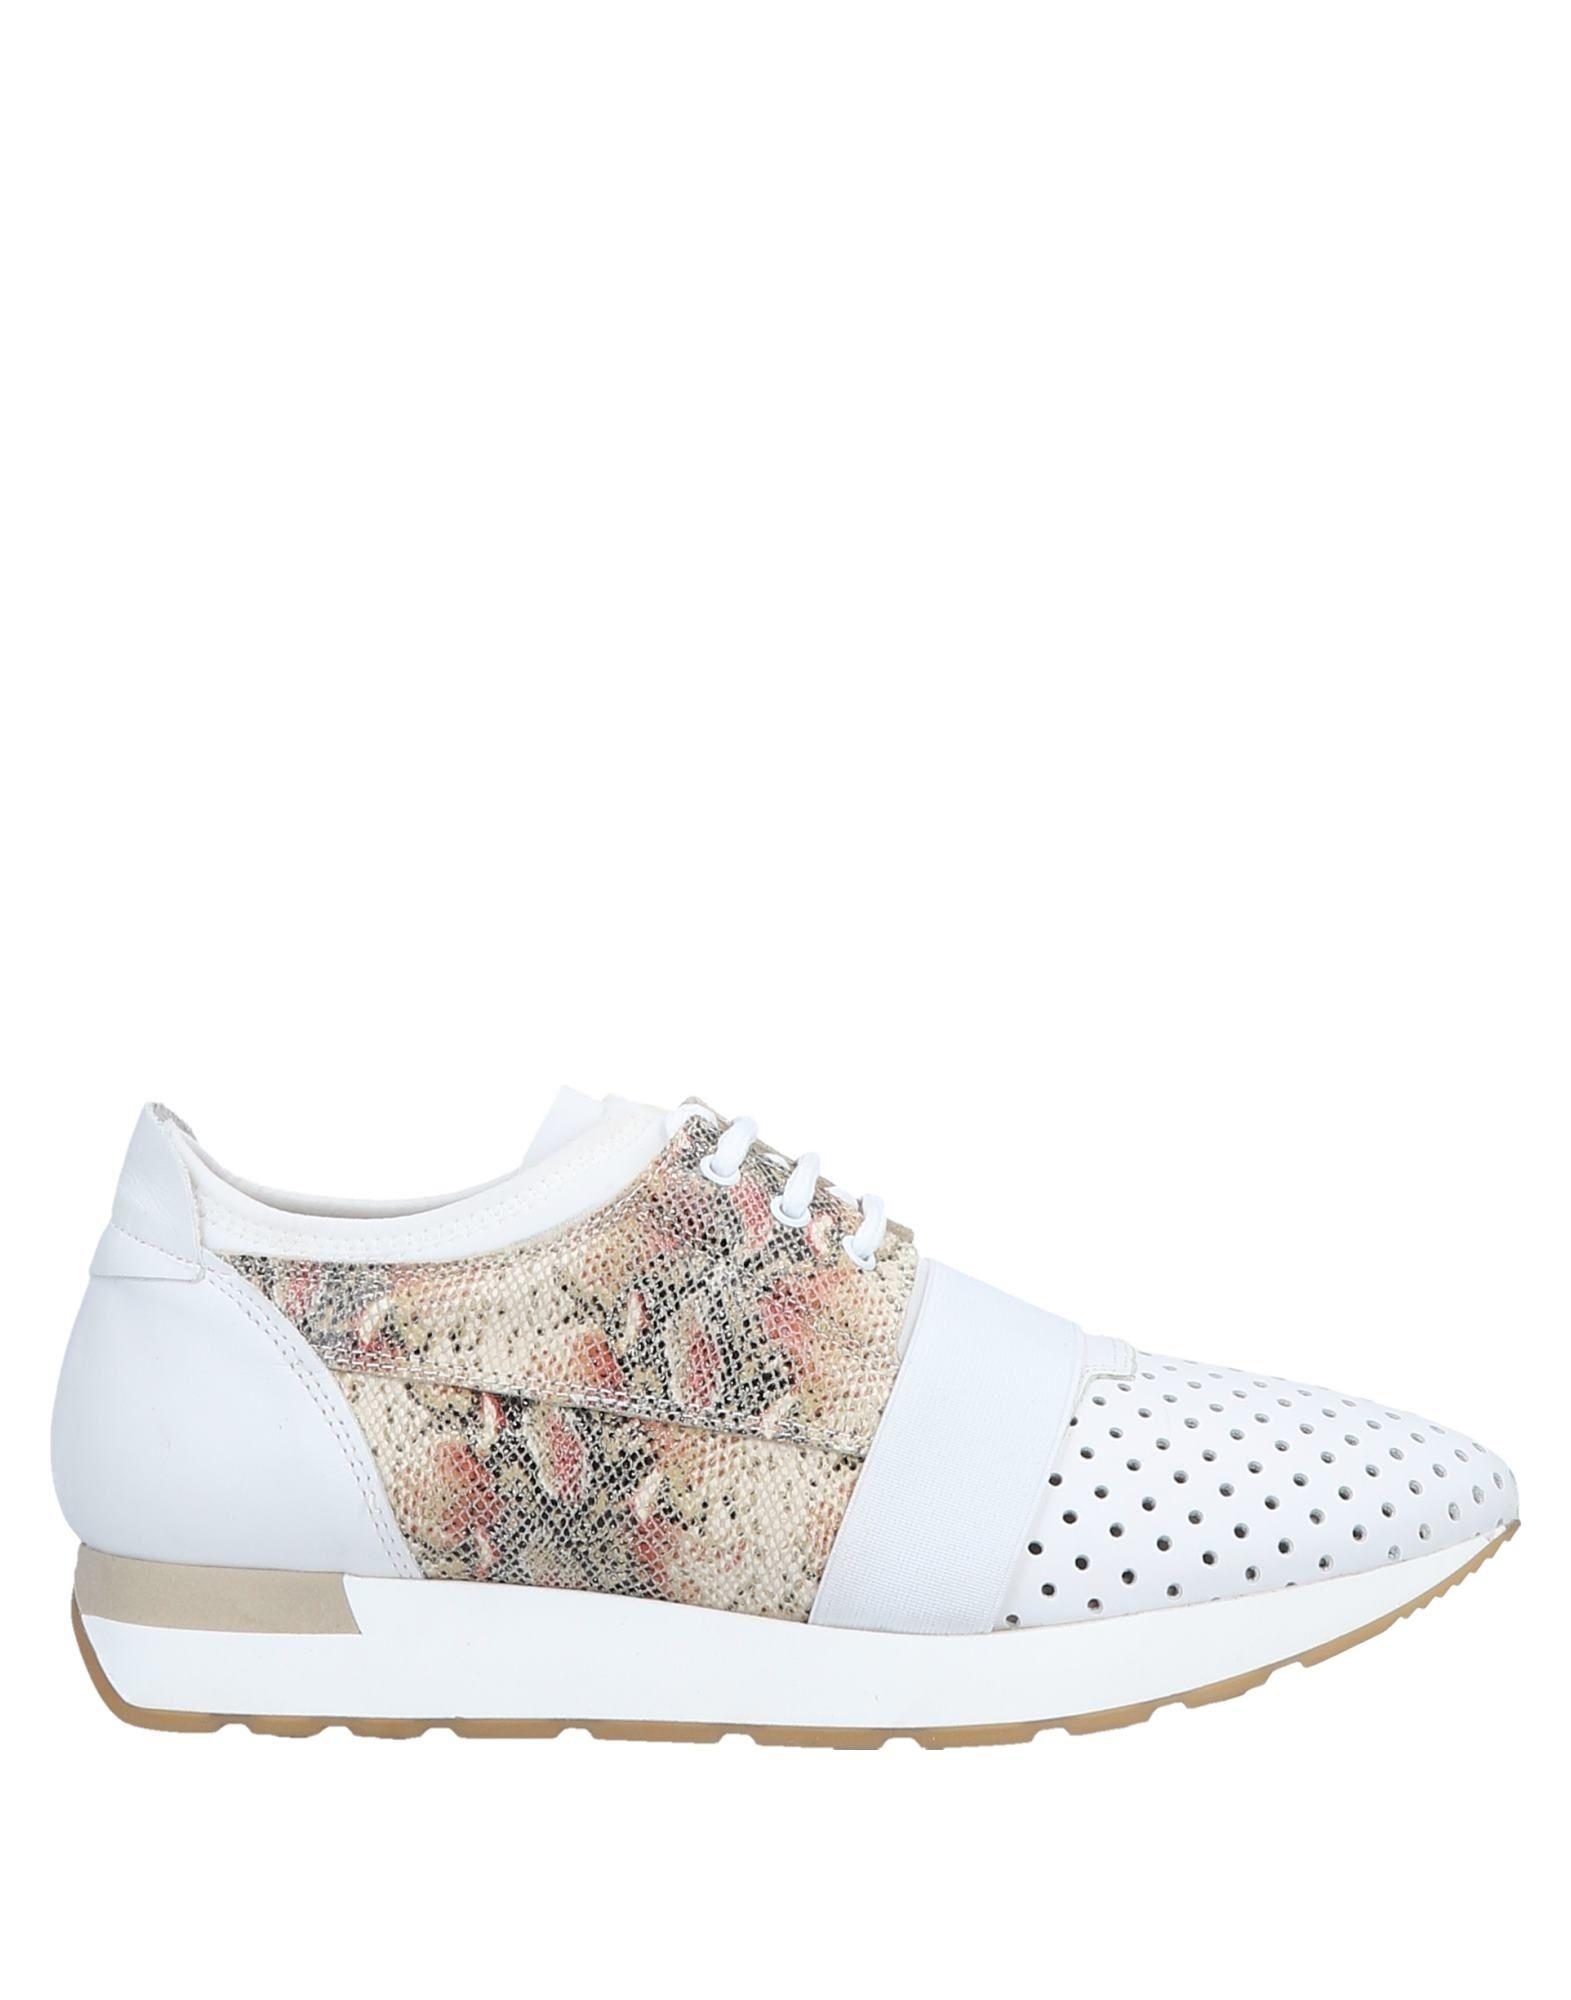 Tsd12  Sneakers - Women Tsd12 Sneakers online on  Tsd12 United Kingdom - 11567430UM e6d6fb